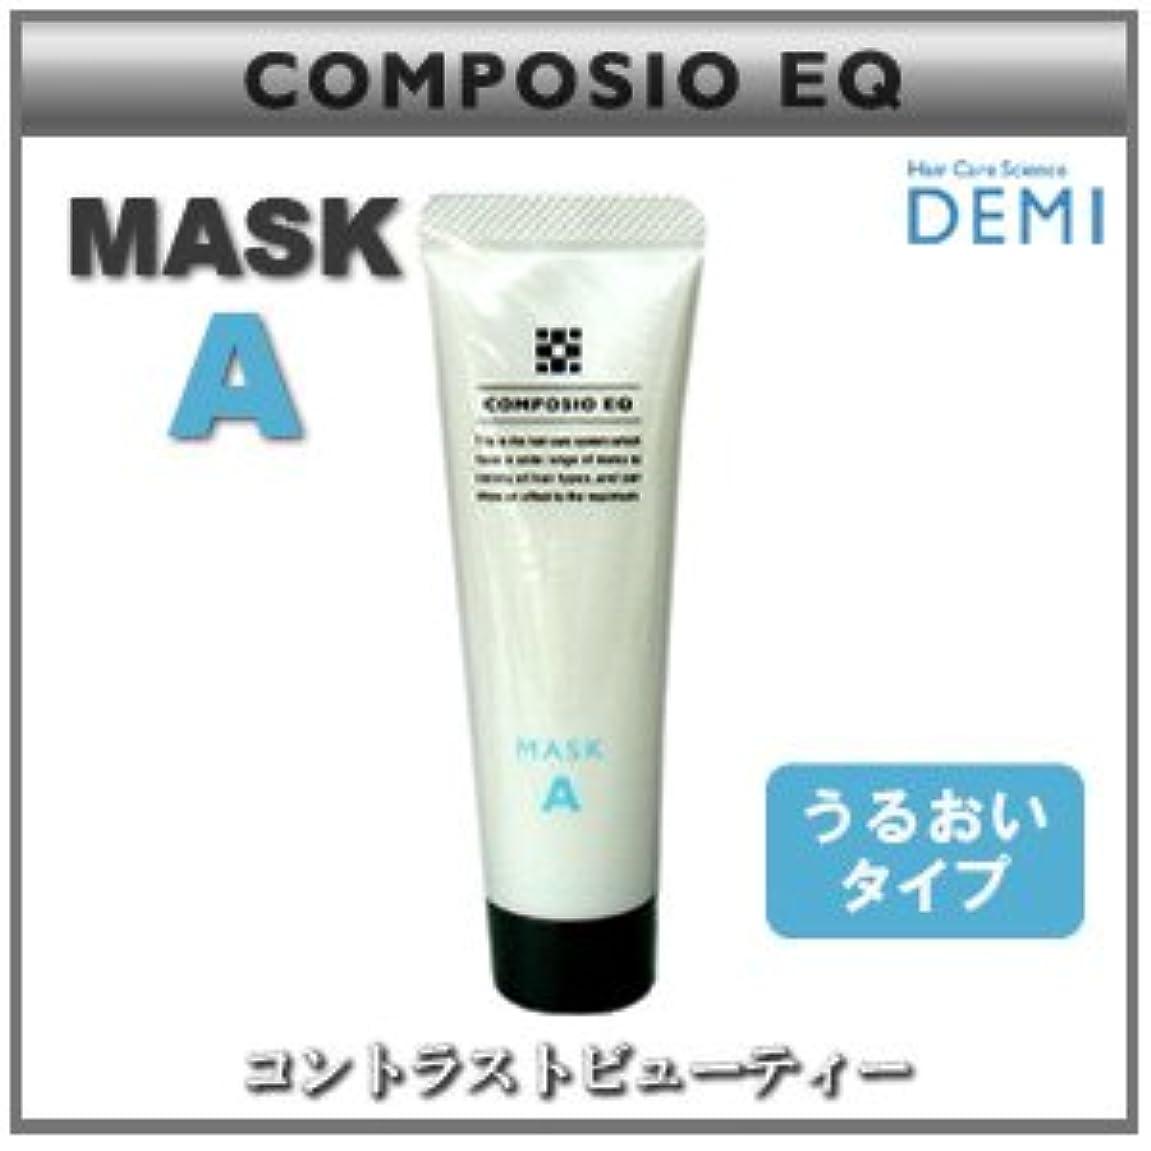 【X5個セット】 デミ コンポジオ EQ マスク A 50g